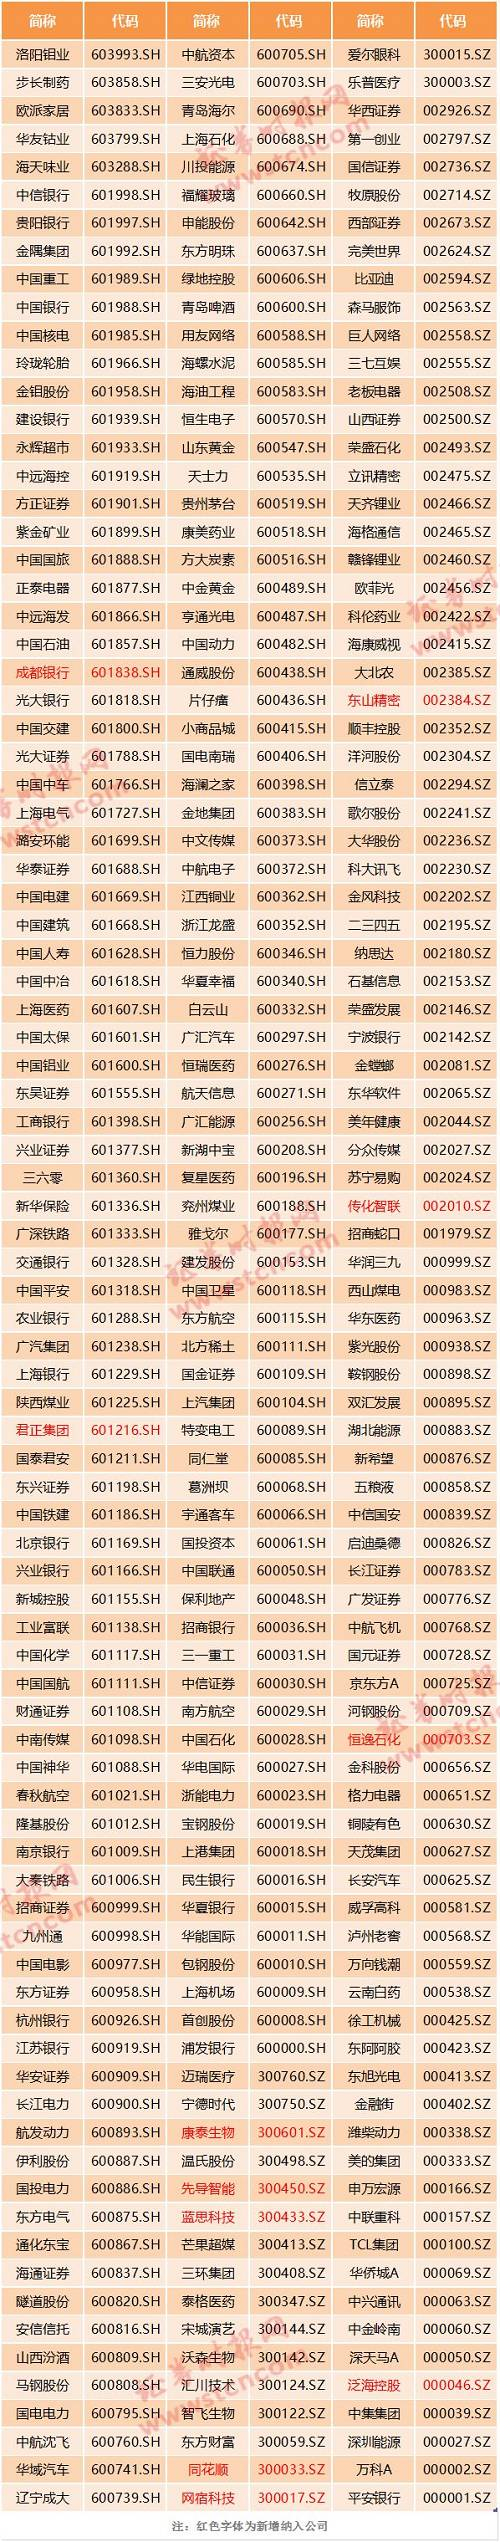 MSCI中国中盘股指数名单: